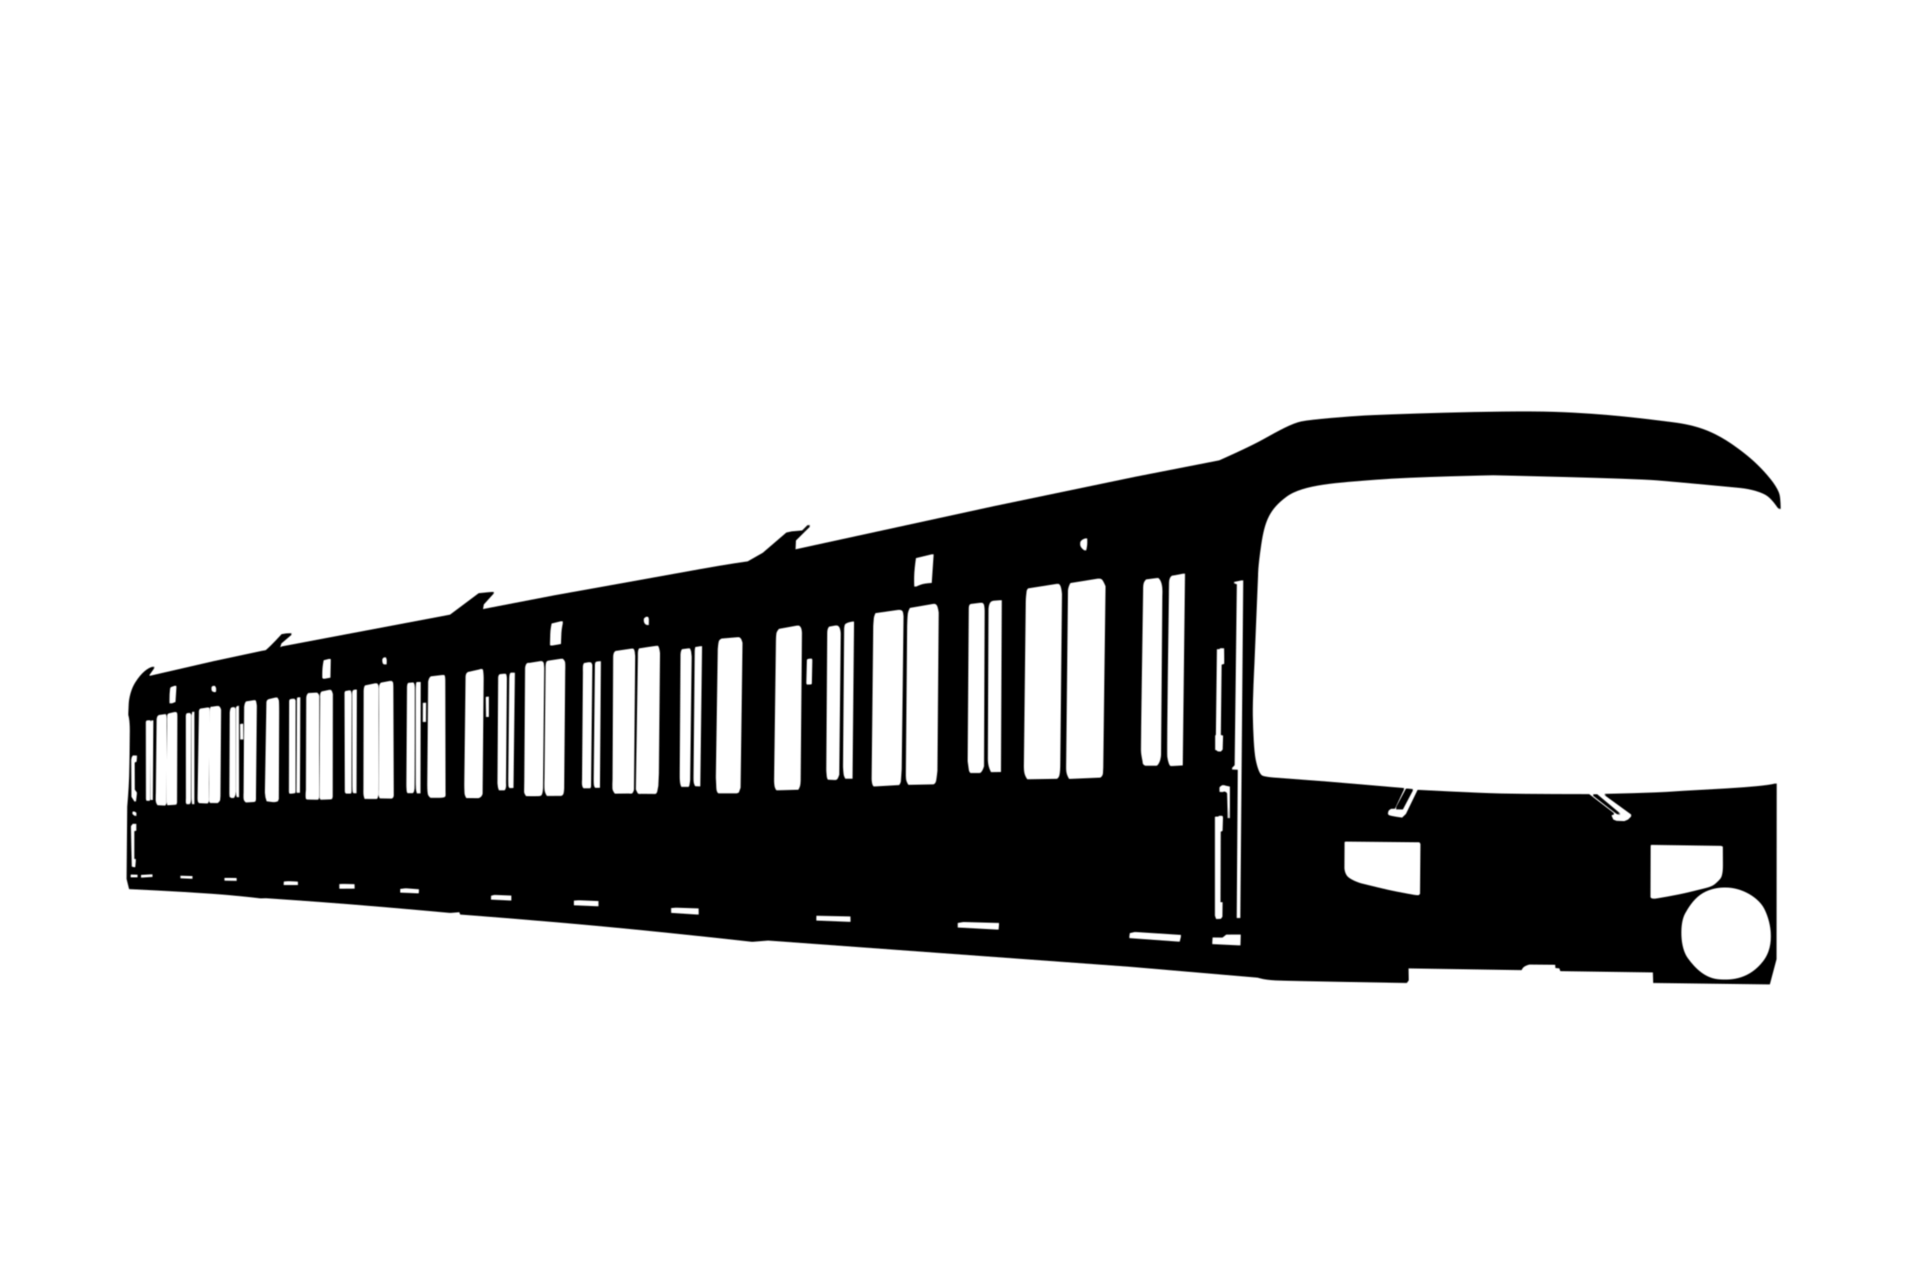 京阪電鉄 800形の型紙